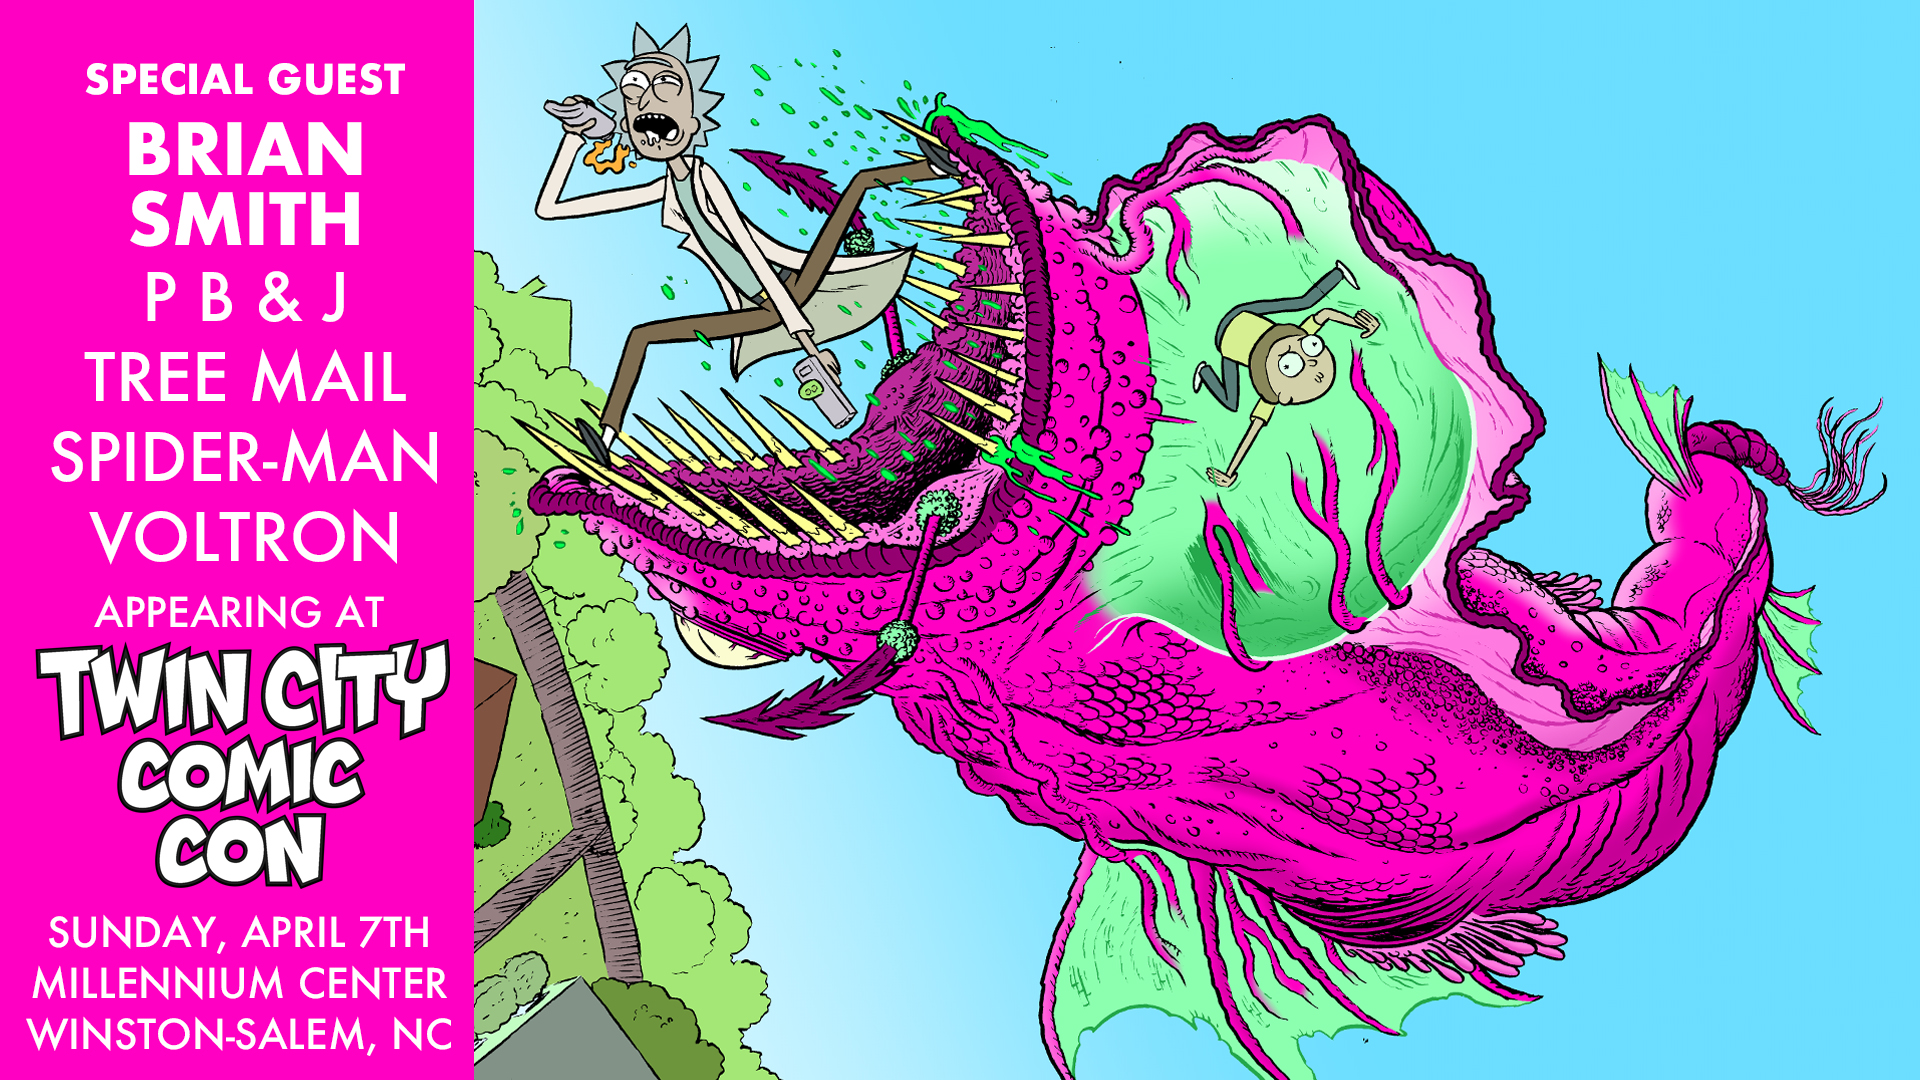 Twin City Comic Con — SSALEFISH COMICS